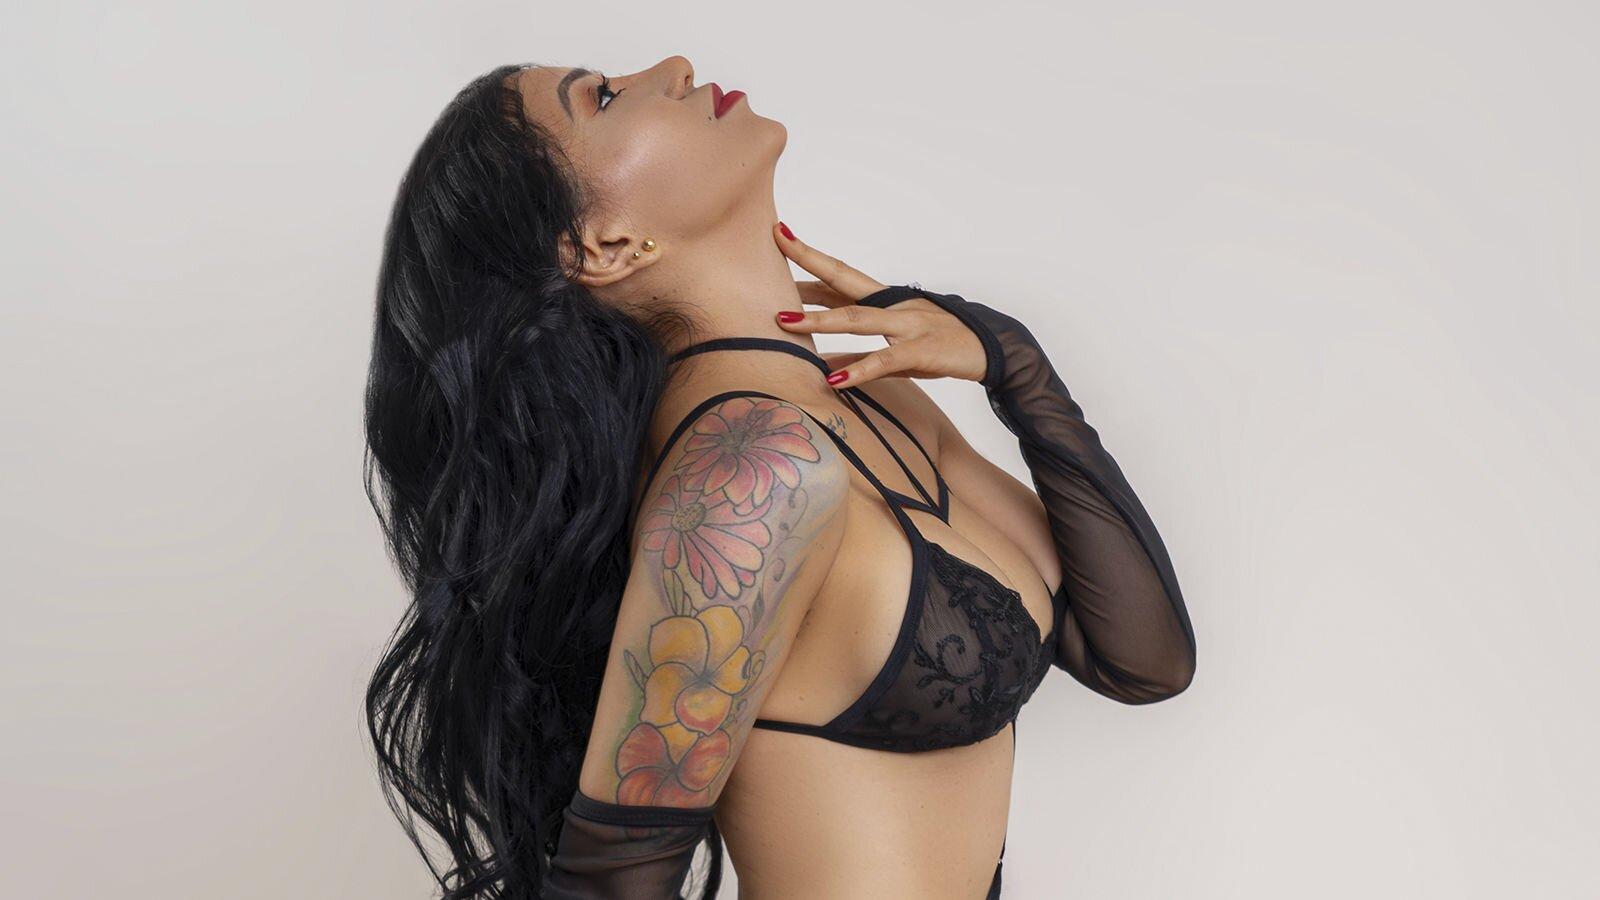 VictoriaKhloe